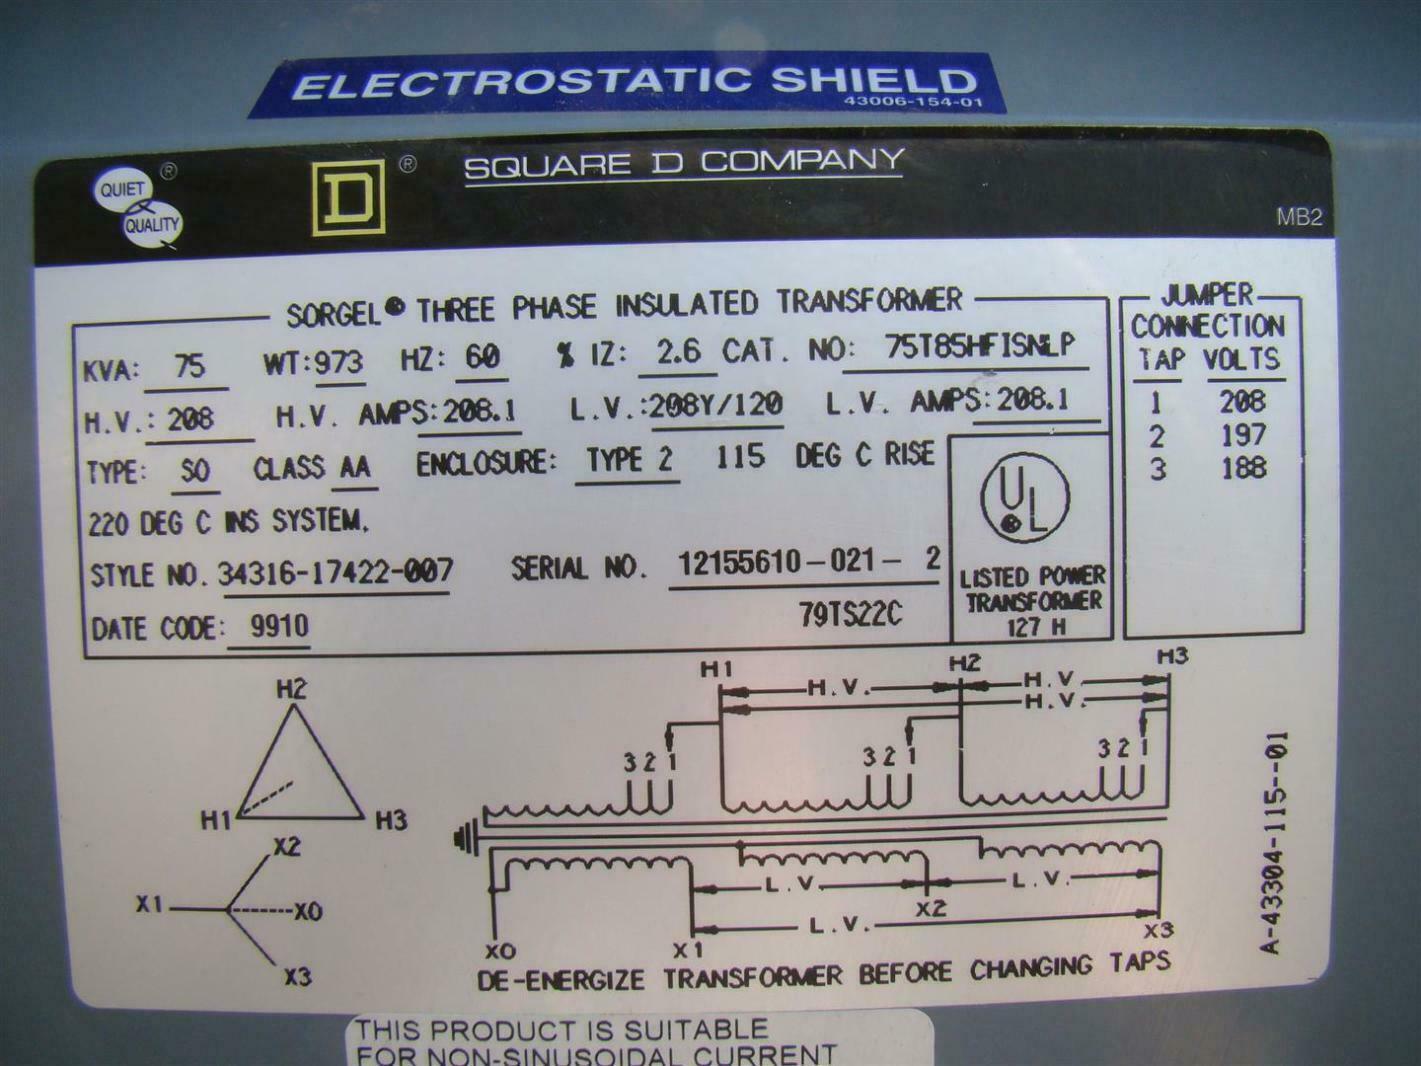 Square D 3 Phase Transformer 208 x 208Y/120 Volt 75 KVA ...